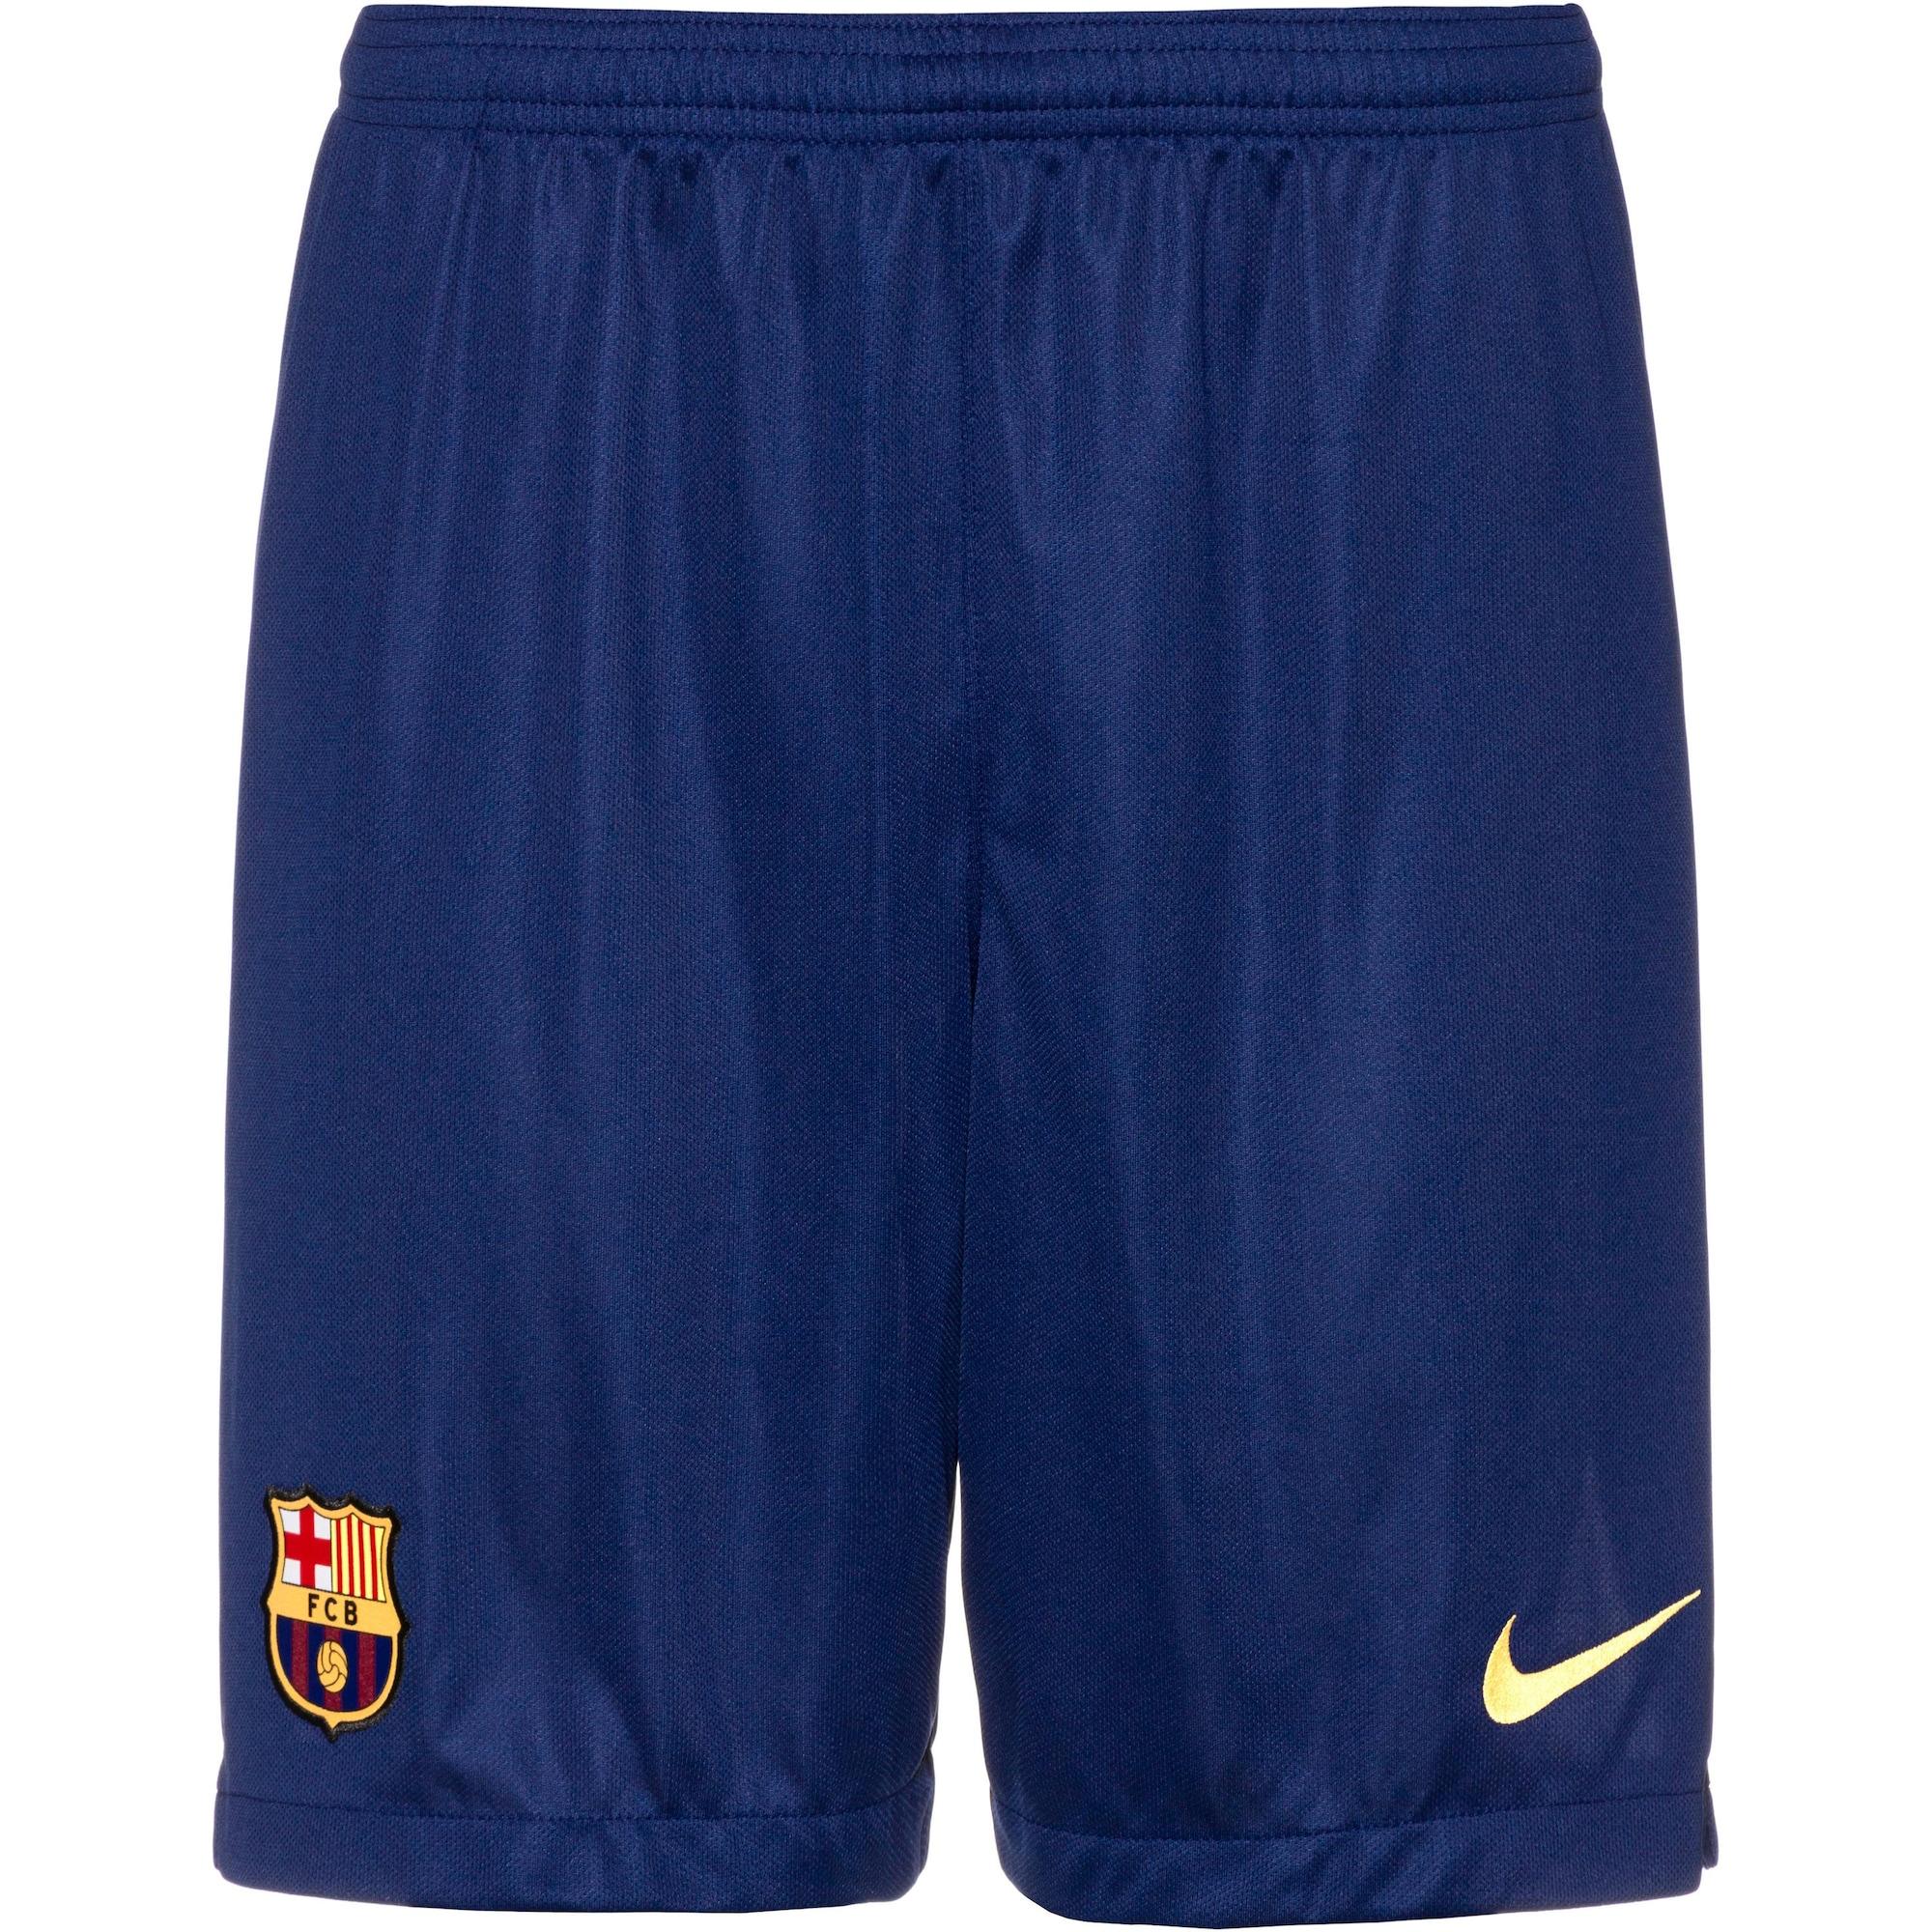 Shorts 'FC Barcelona 19/20 Heim' | Bekleidung > Shorts & Bermudas > Shorts | Nike